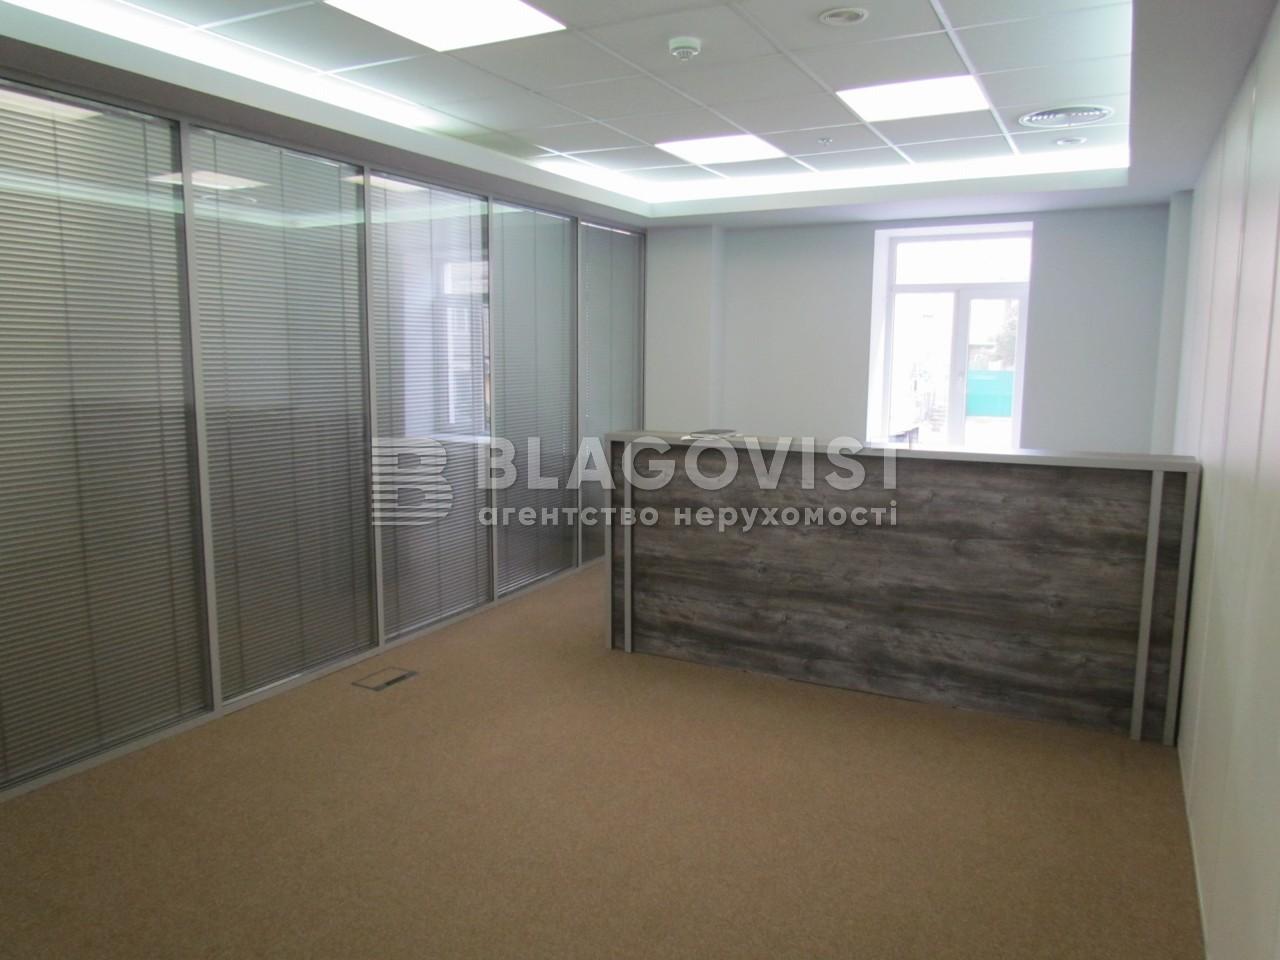 Бизнес-центр, P-19804, Сагайдачного Петра, Киев - Фото 4